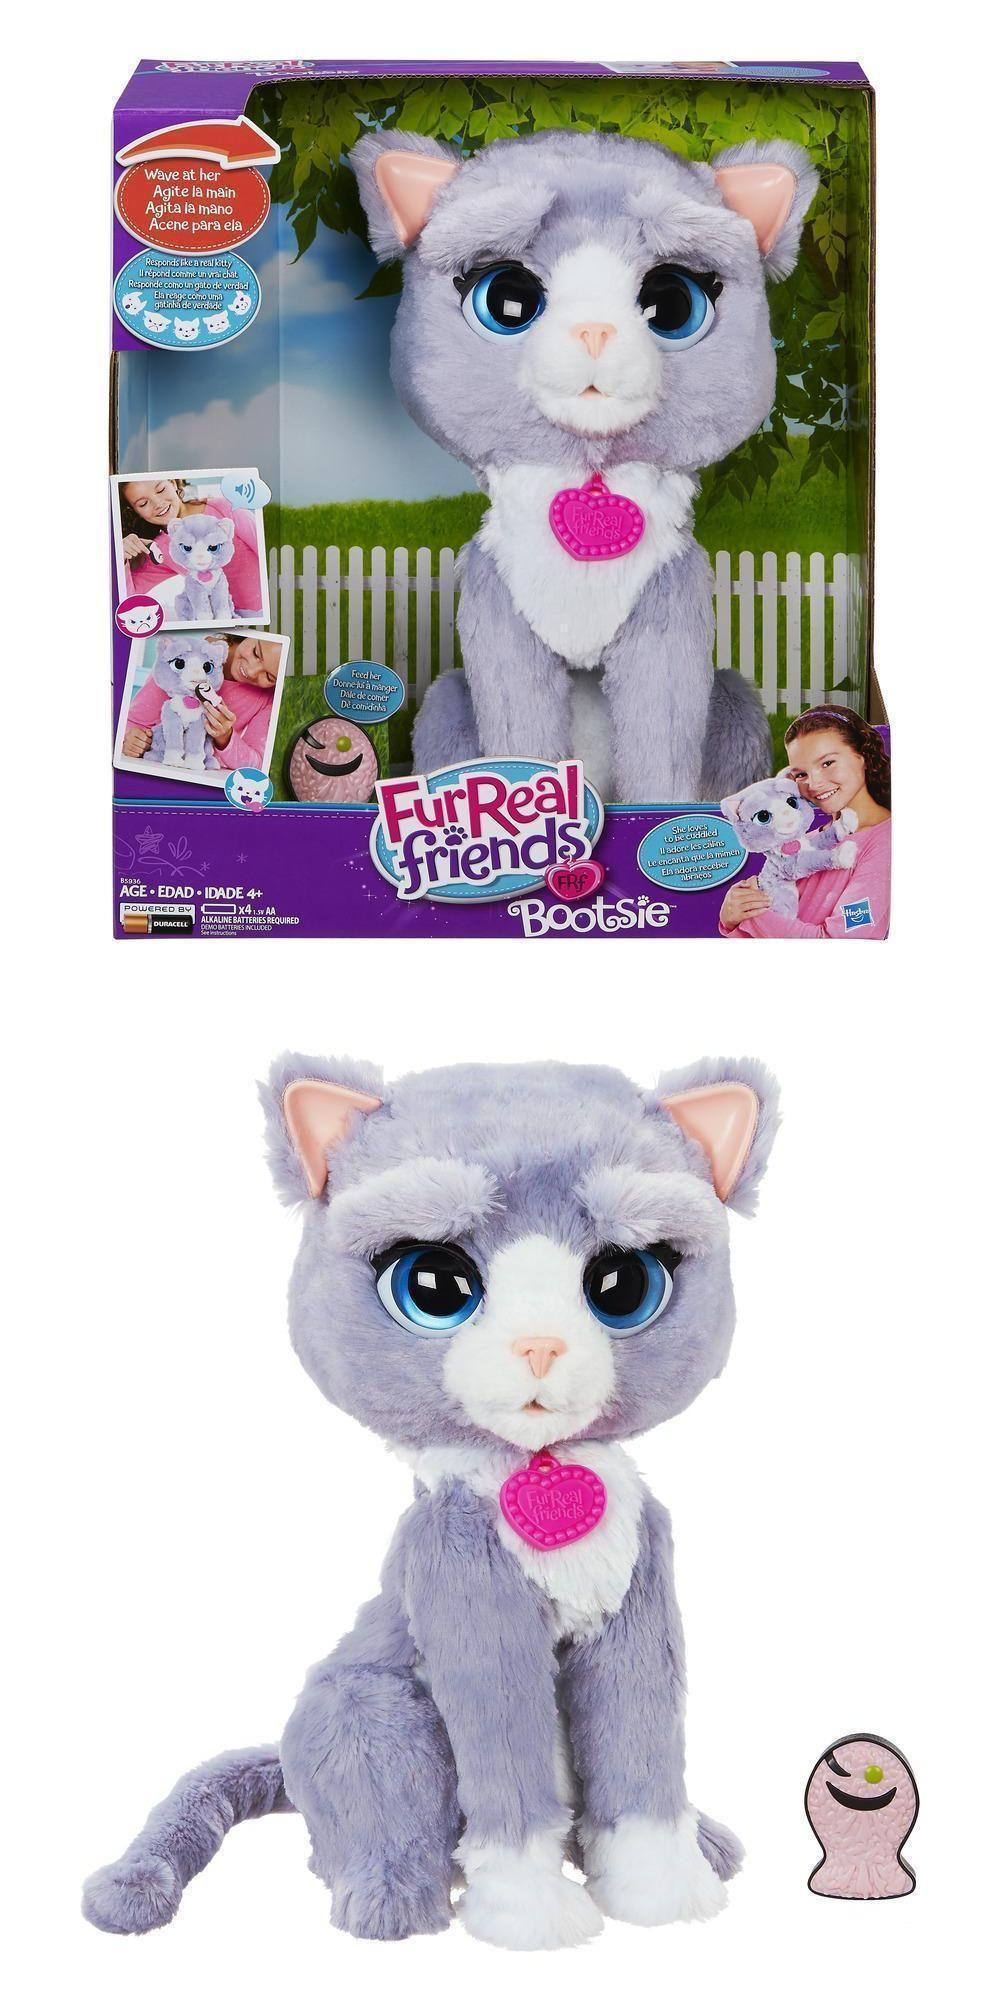 Furreal Friends 38288 New Furreal Friends Bootsie The Cat